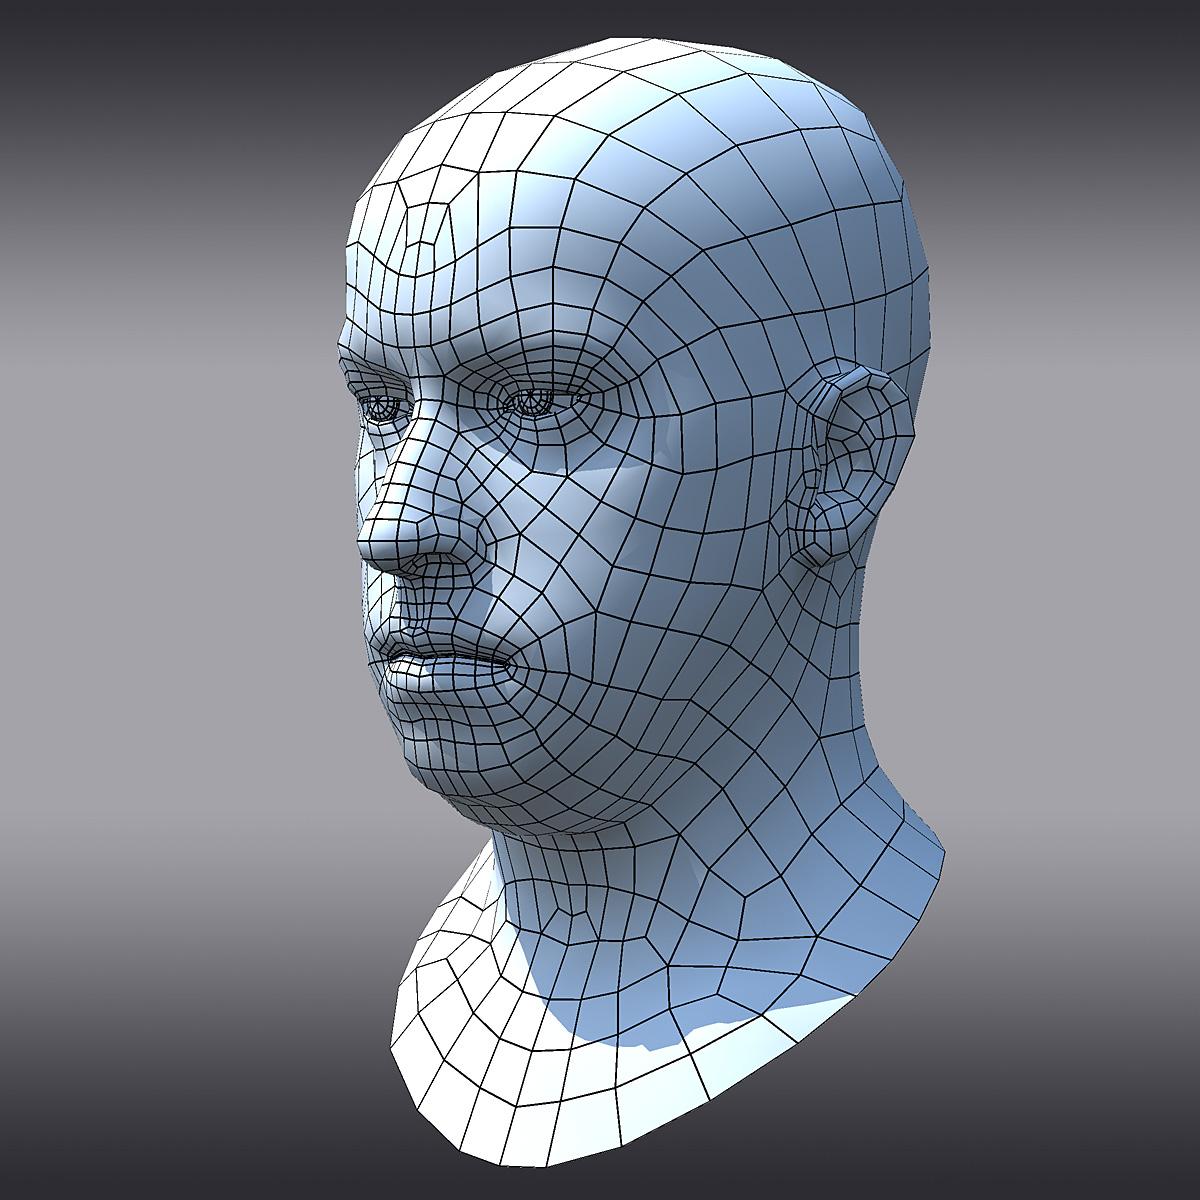 3D Male Head (Nikolay) - Digital Sculpting by Voronart